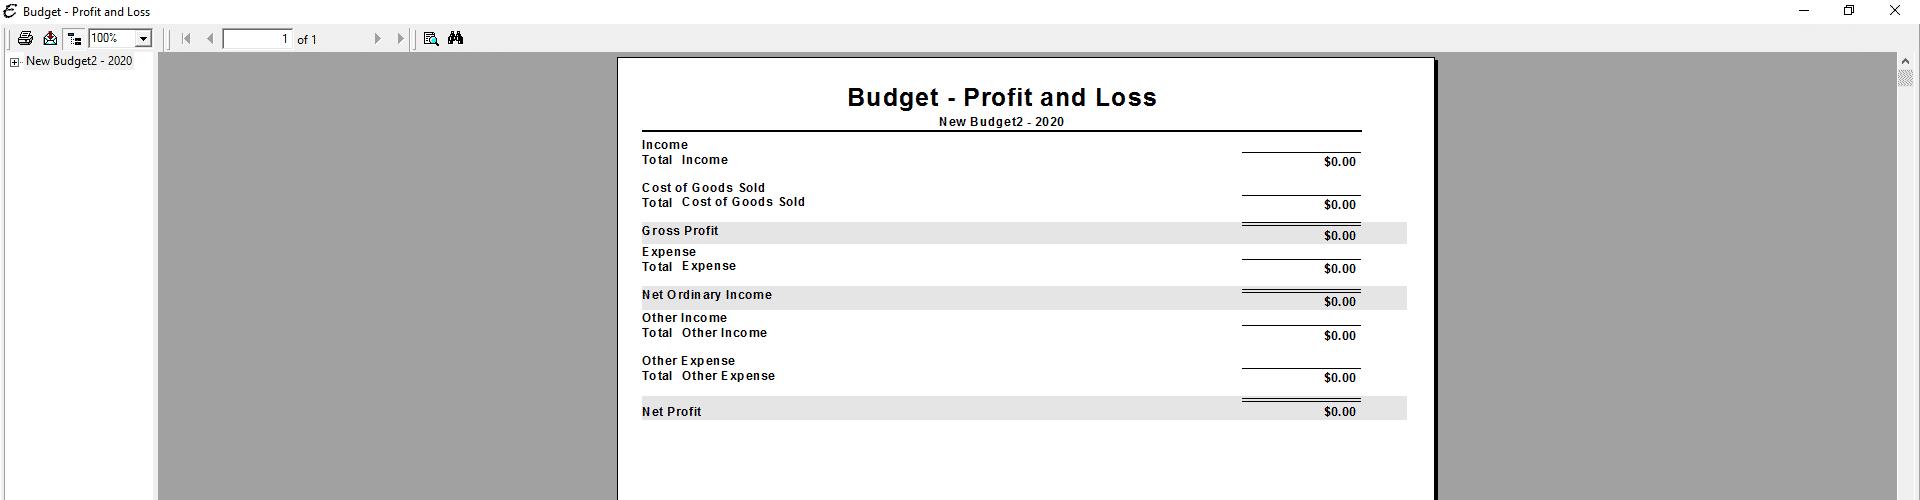 Sample Budget Report